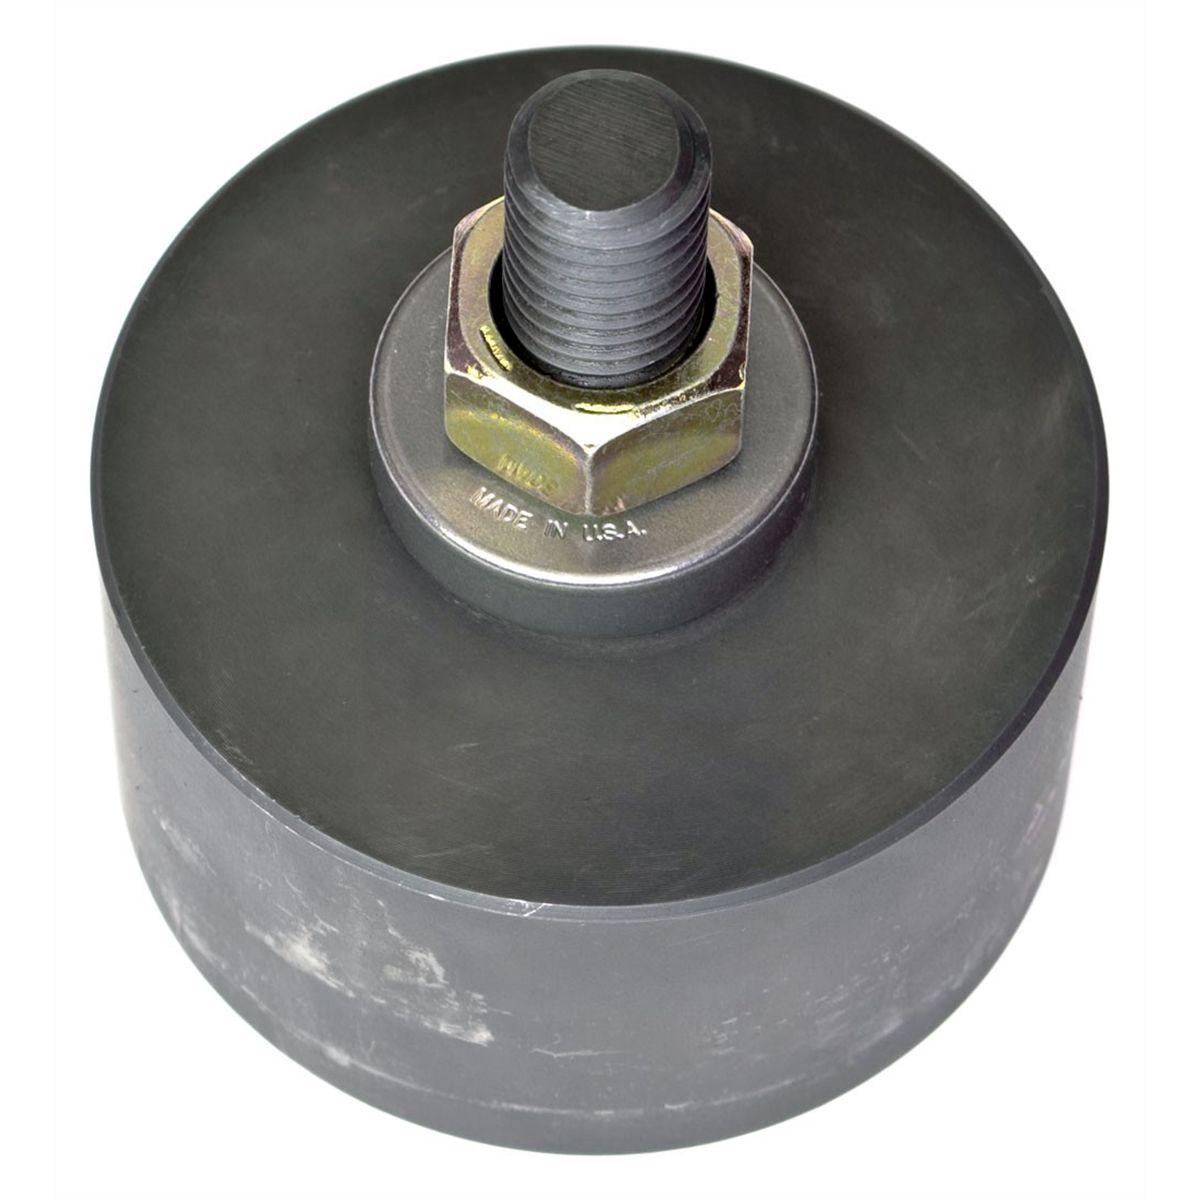 Crankshaft Front Seal and Wear Ring Installer | OTC - SPX | 303-761